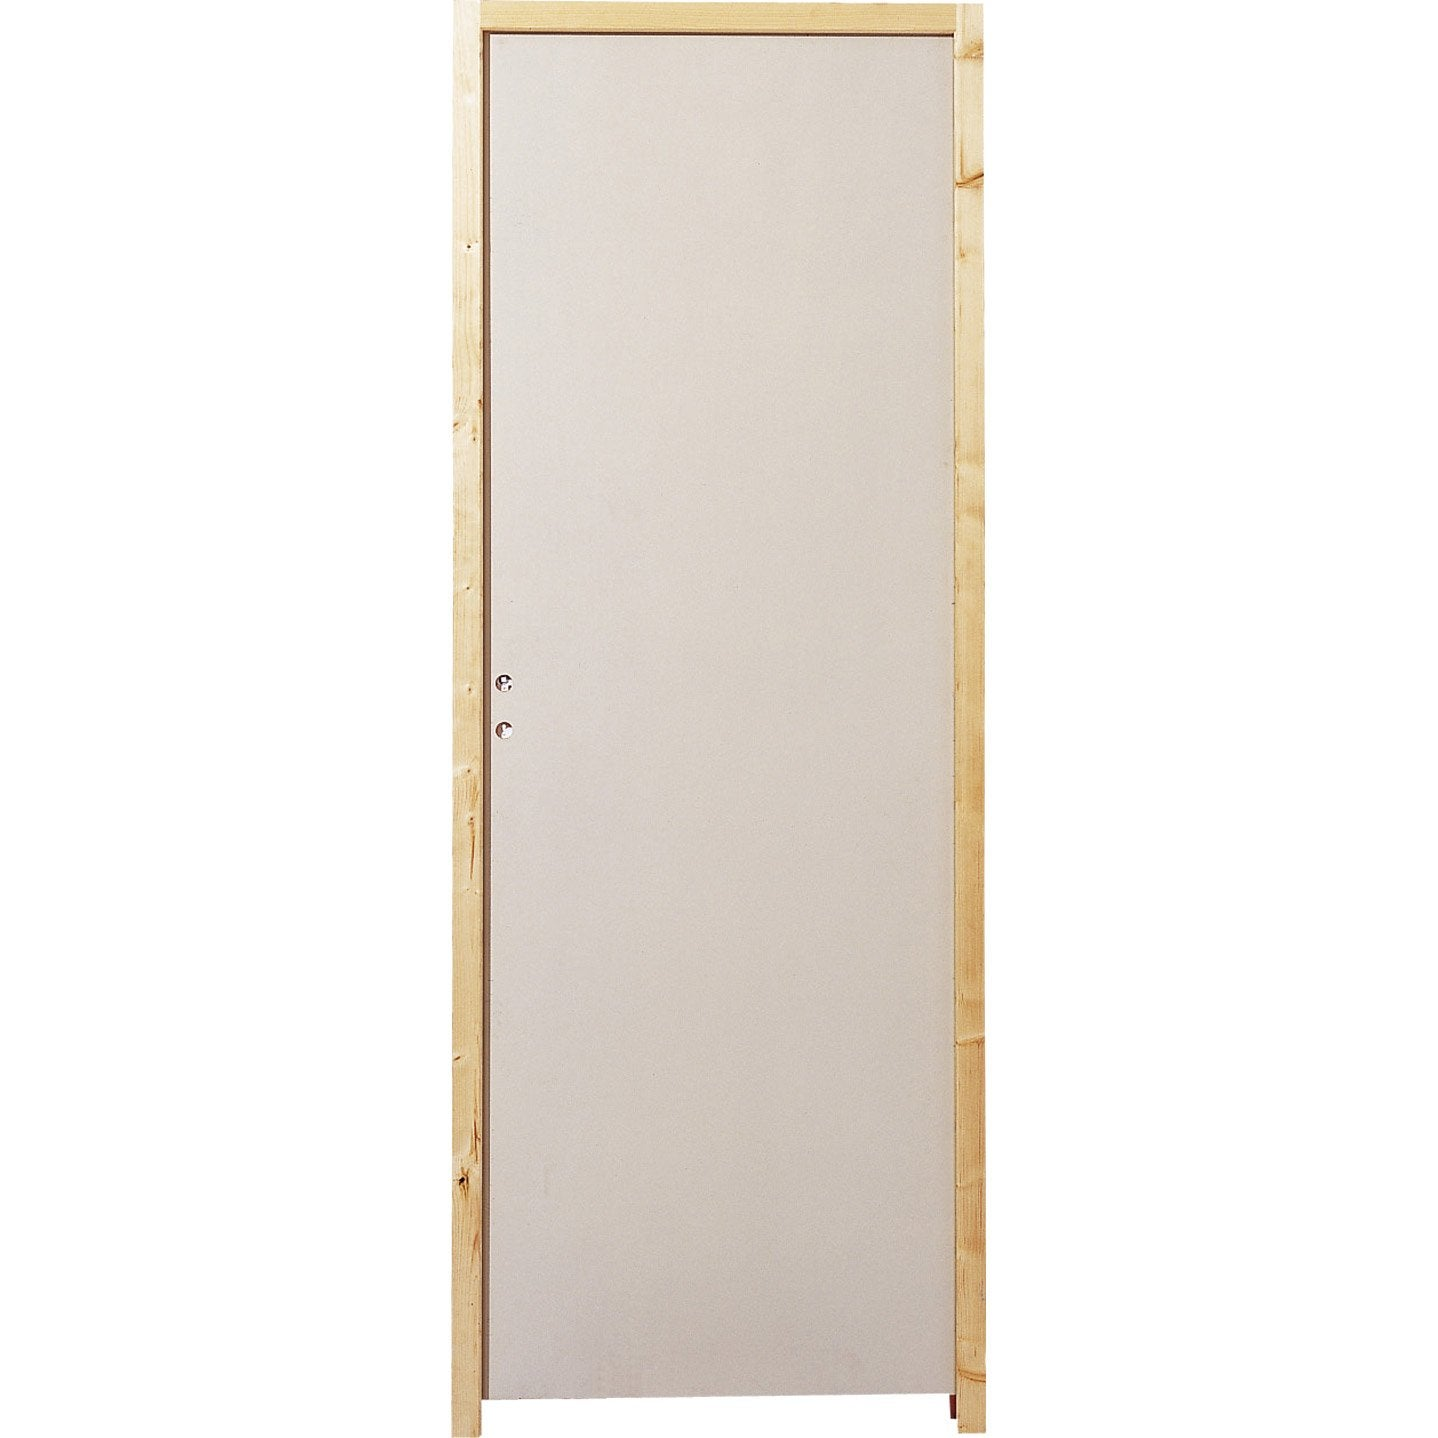 Bloc porte isoplane isoplane x cm poussant for Prix porte interieure vitree